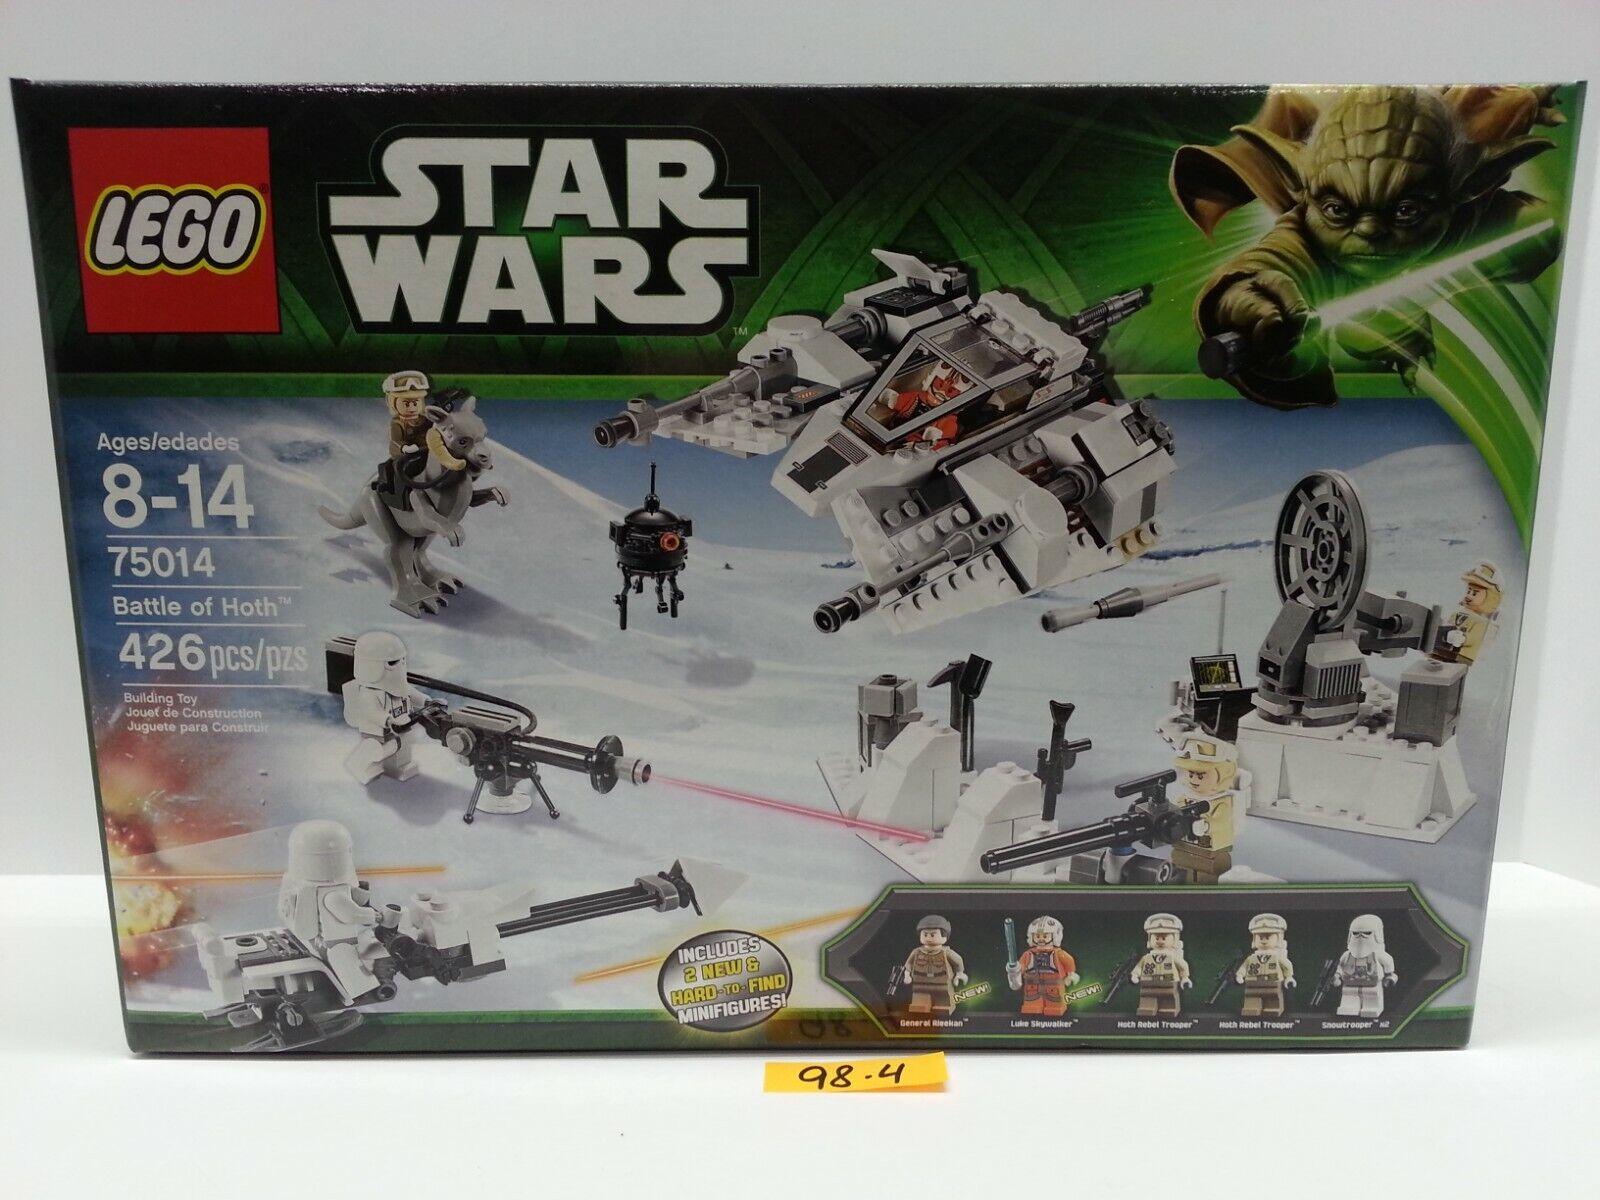 LEGO Star Wars Battle Battle Battle of HOTH 75014 - 5 Minifigures - BRAND NEW & FACTORY SEALED f19d65